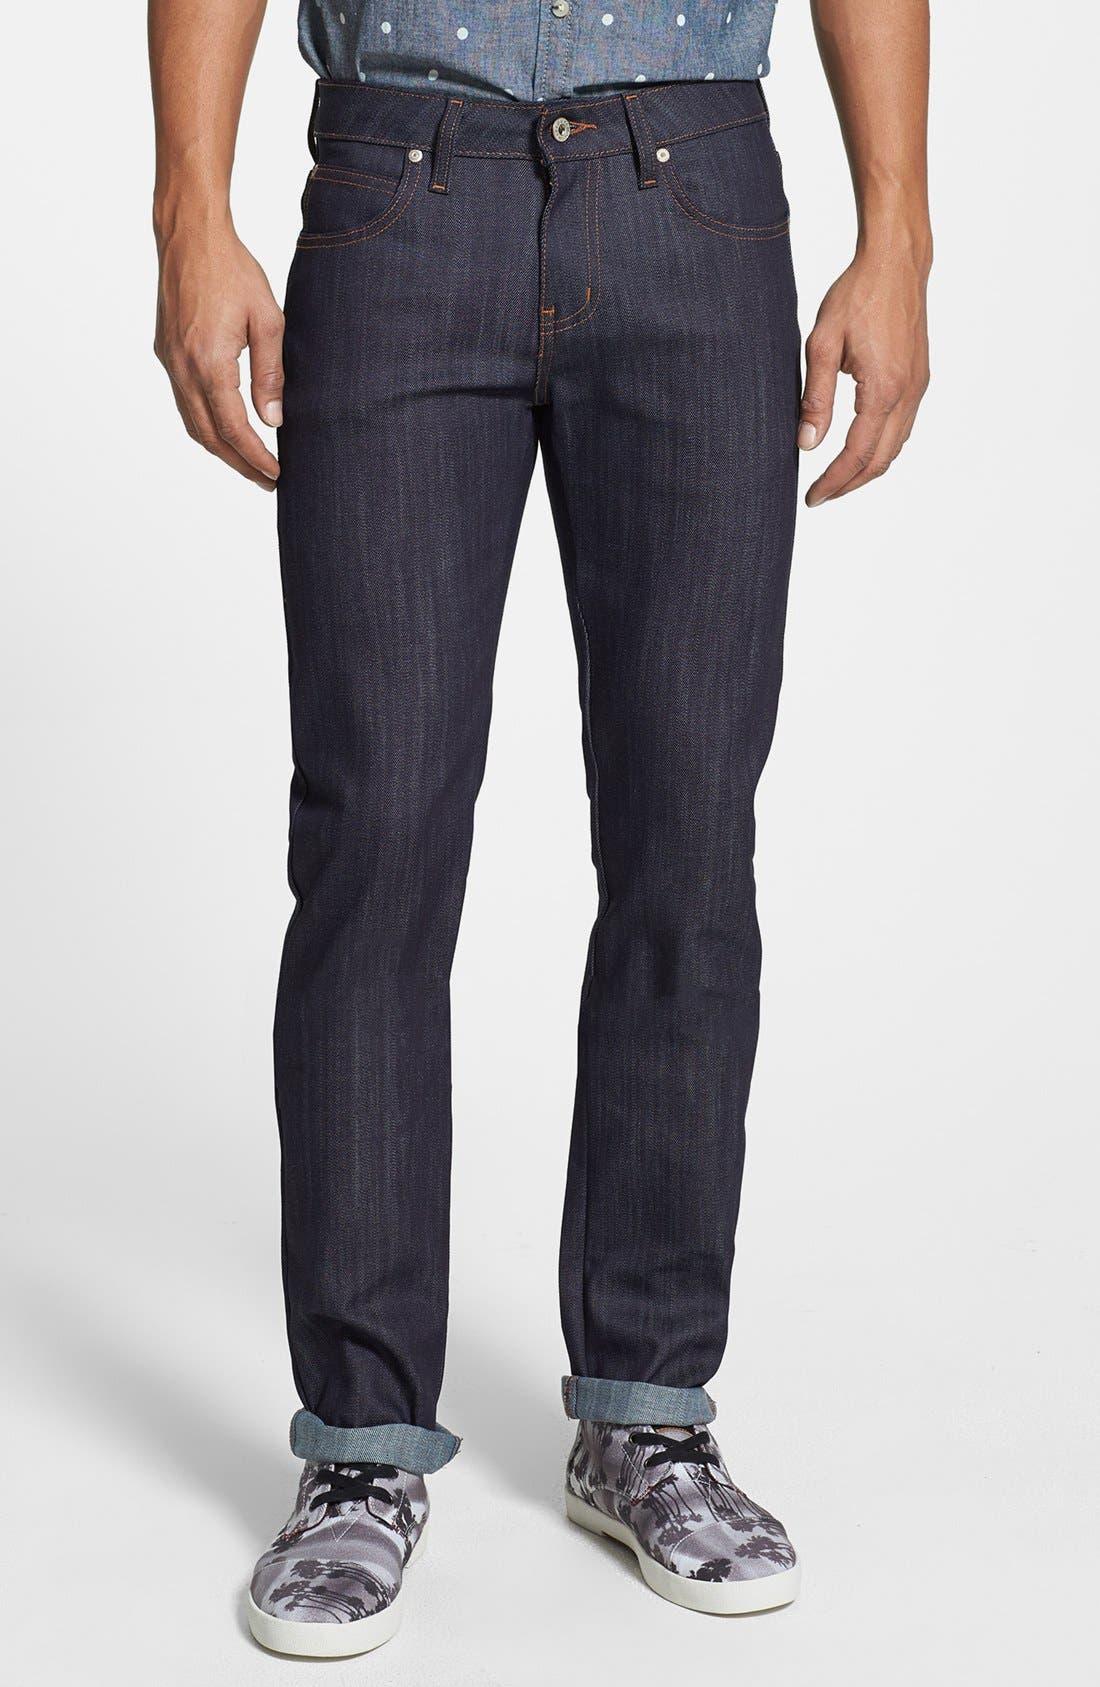 'Skinny Guy' Skinny Fit Jeans, Main, color, 401